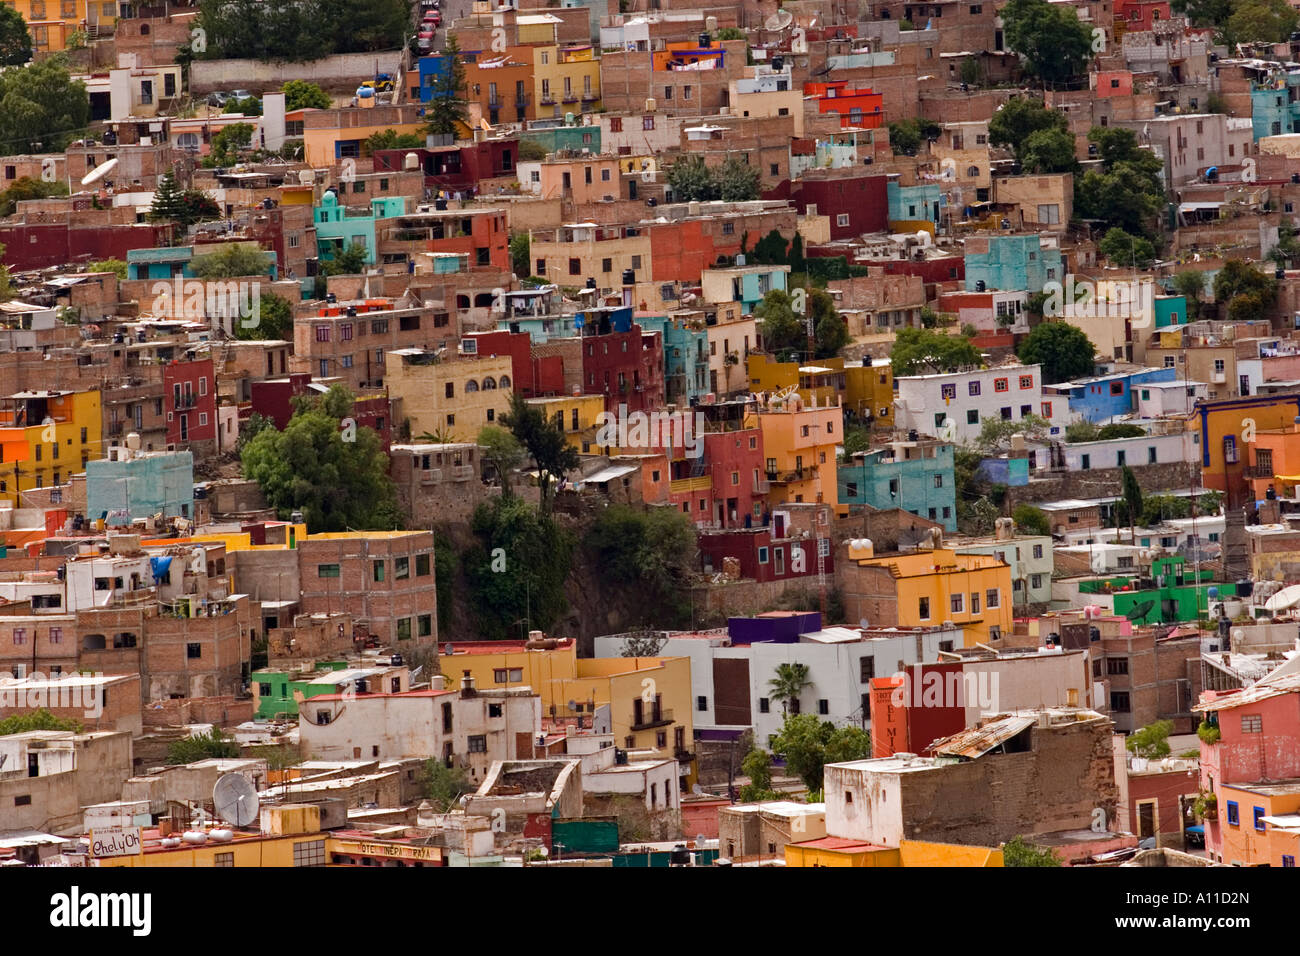 66ccb6eec3b6 A Guanajuato centre airview (Mexico). Vue d ensemble de la ville de  Guanajuato (Guanajuato, Mexique).